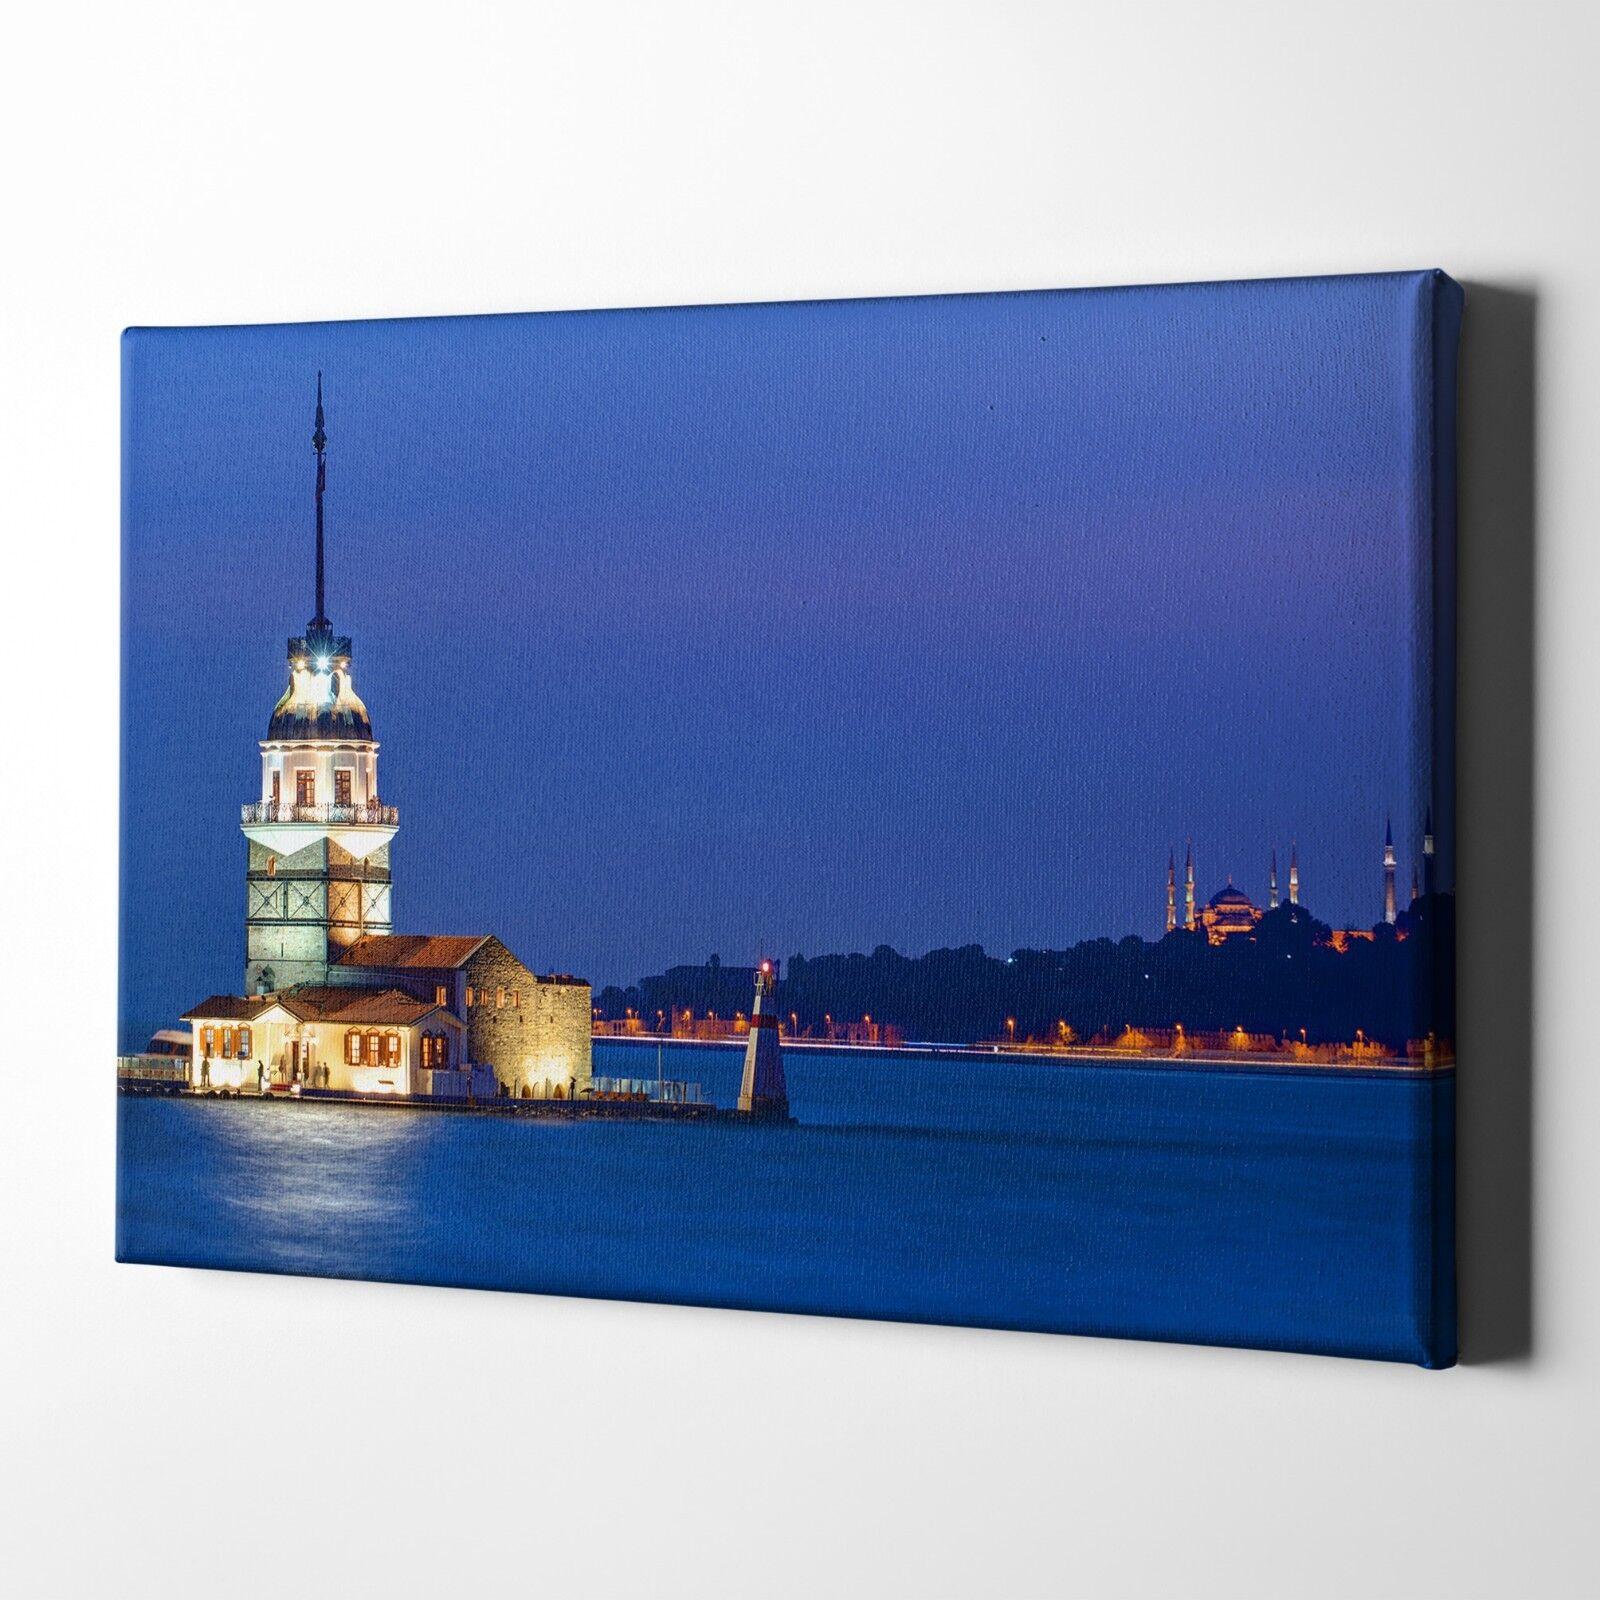 Leanderturm Kiz Kulesi Mädchenturm Foto-Leinwand inkl. Keilrahmen   Poster